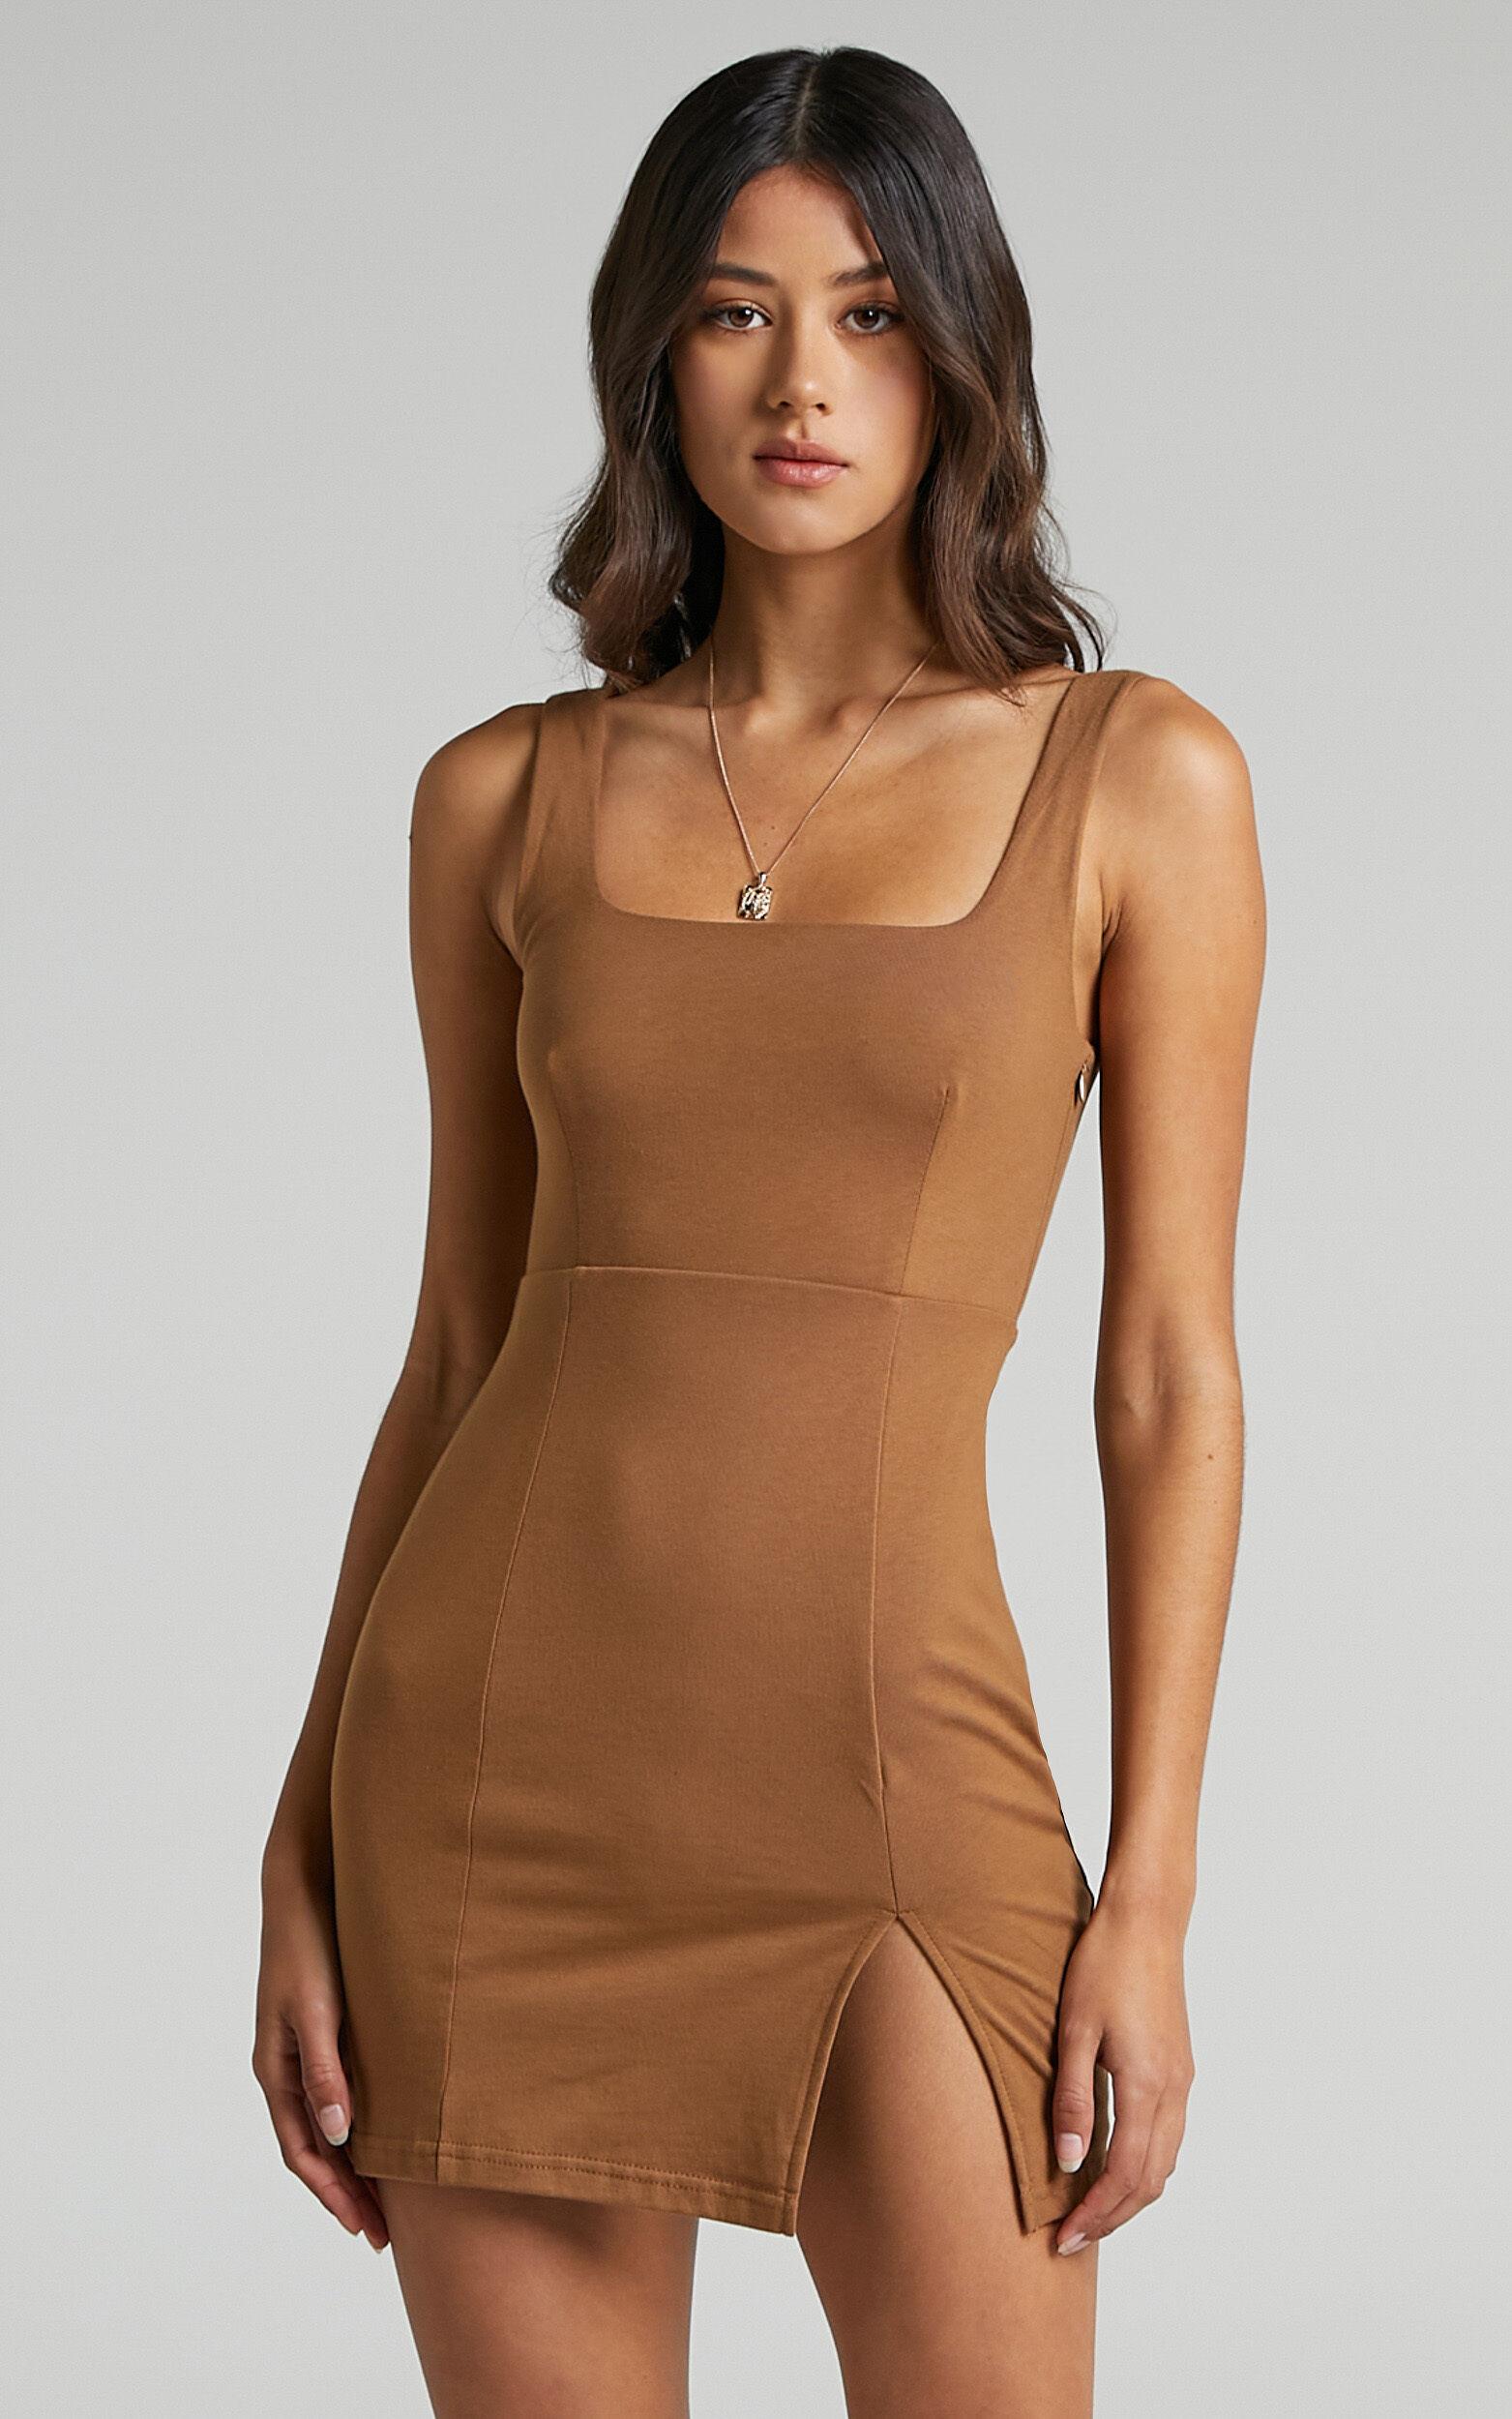 Hughes Square Neck Mini Dress in Chocolate - 06, BRN2, super-hi-res image number null